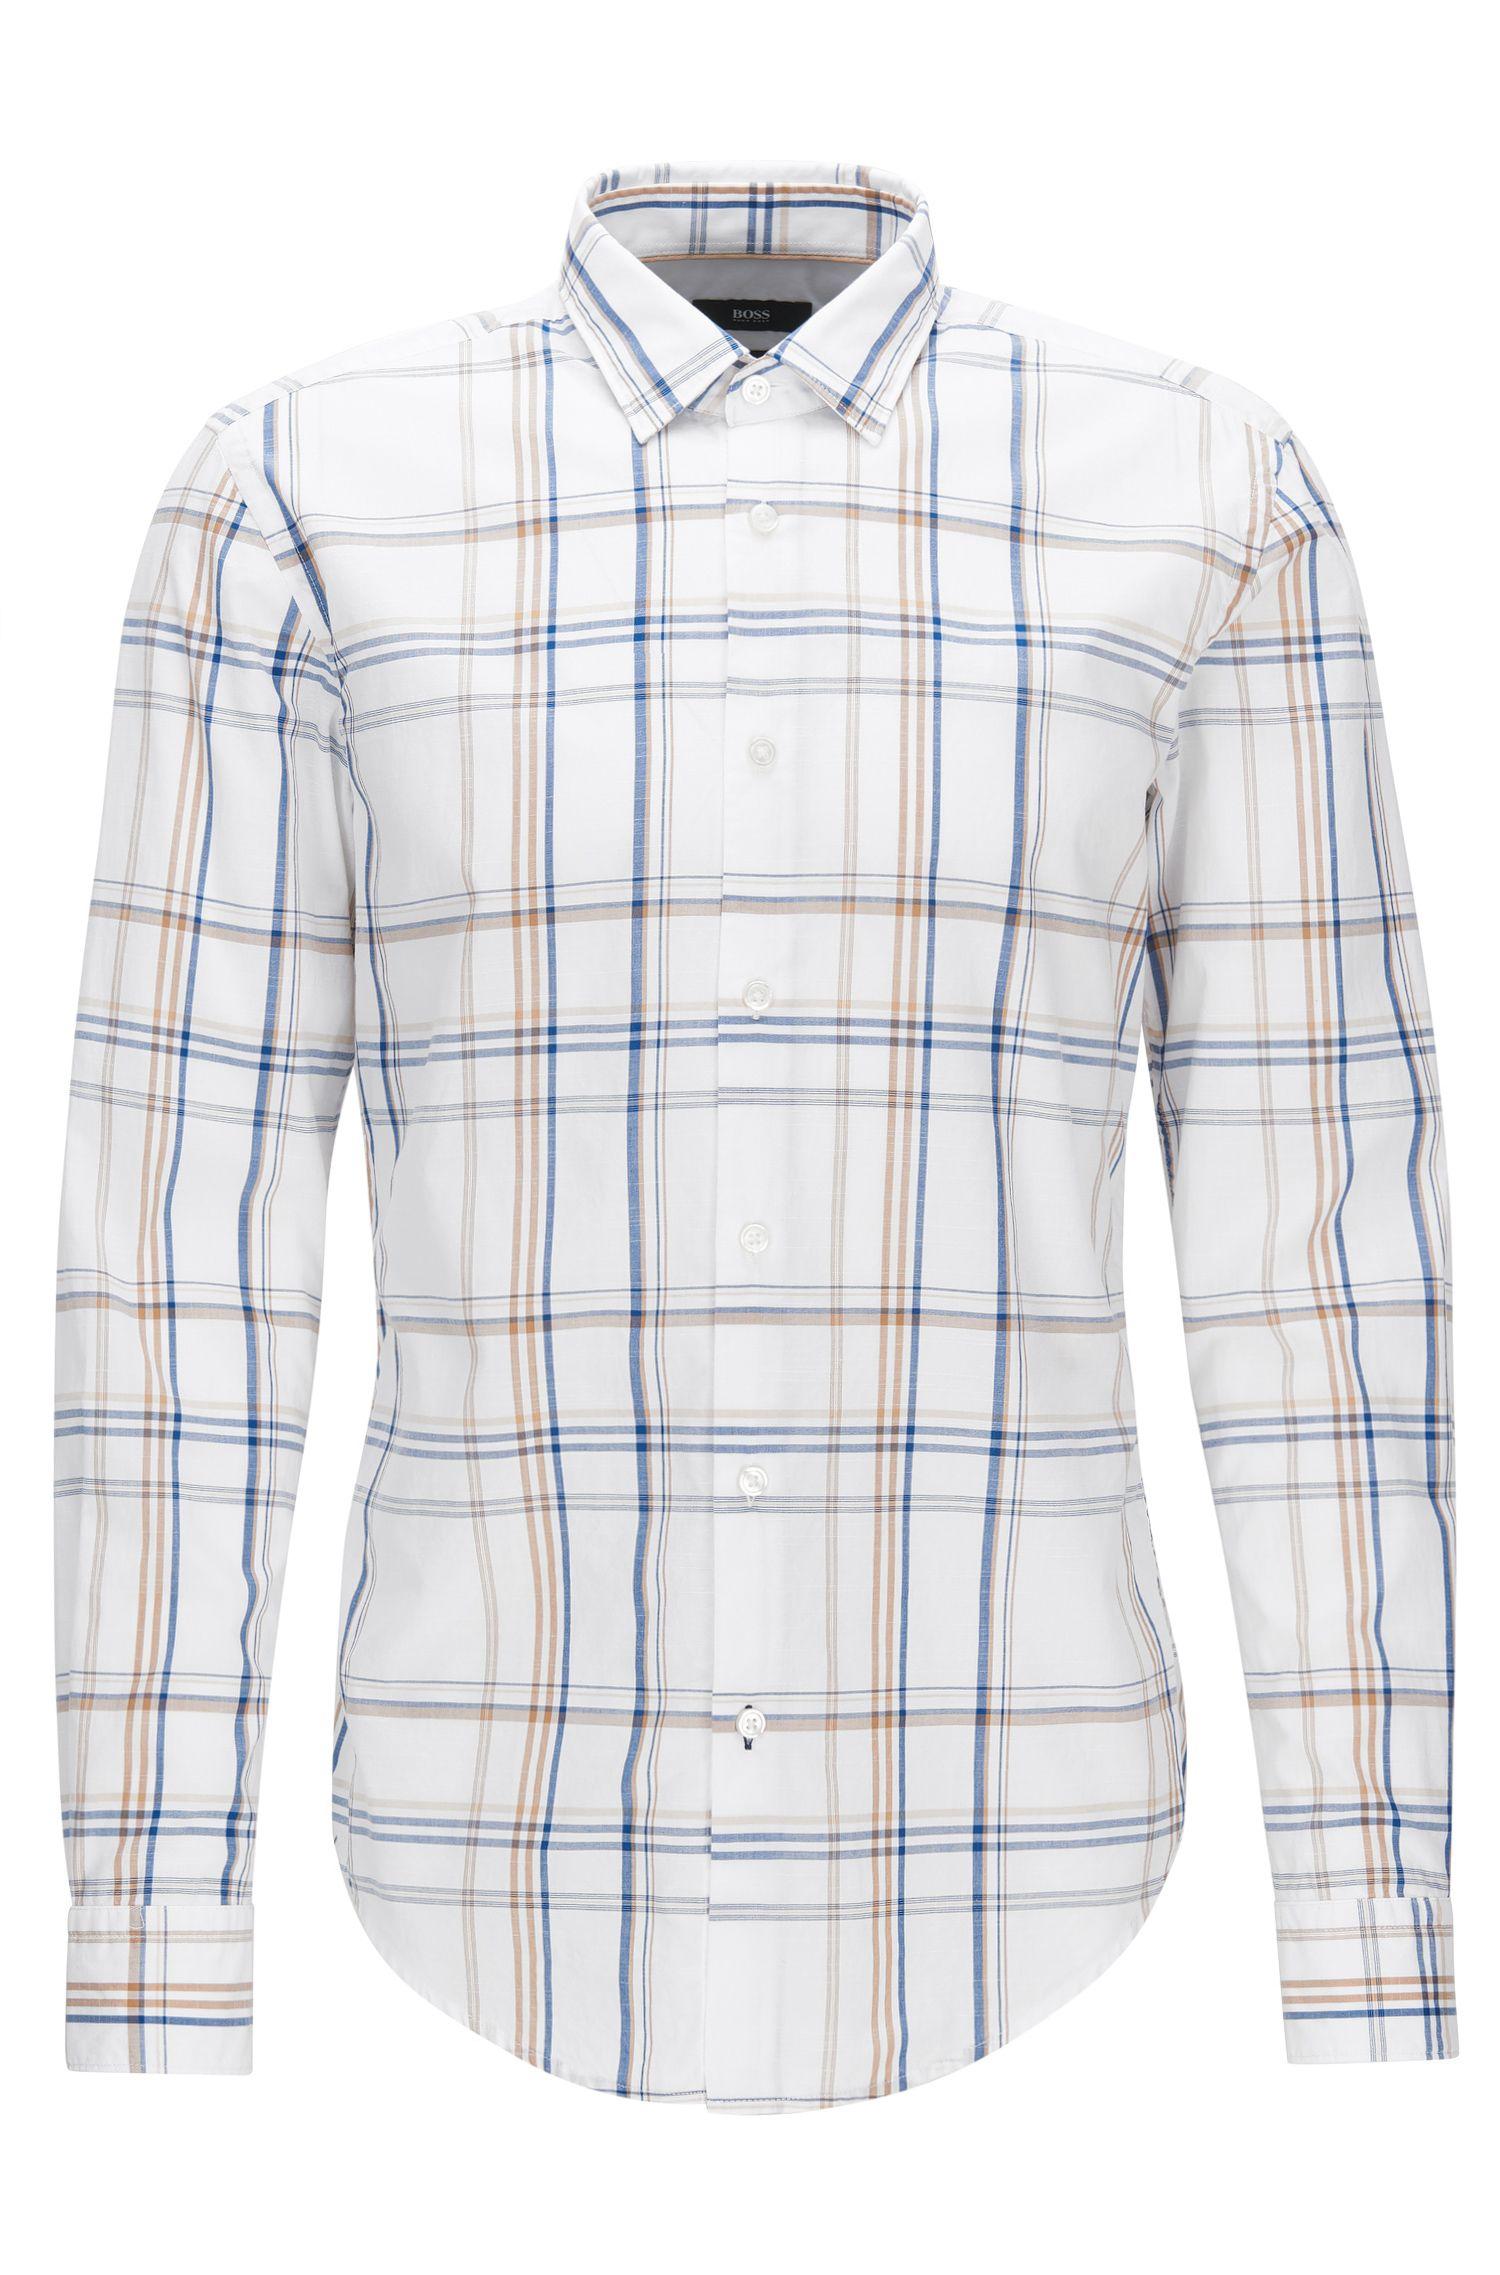 'Ronni H' | Slim Fit, Plaid Cotton Button Down Shirt